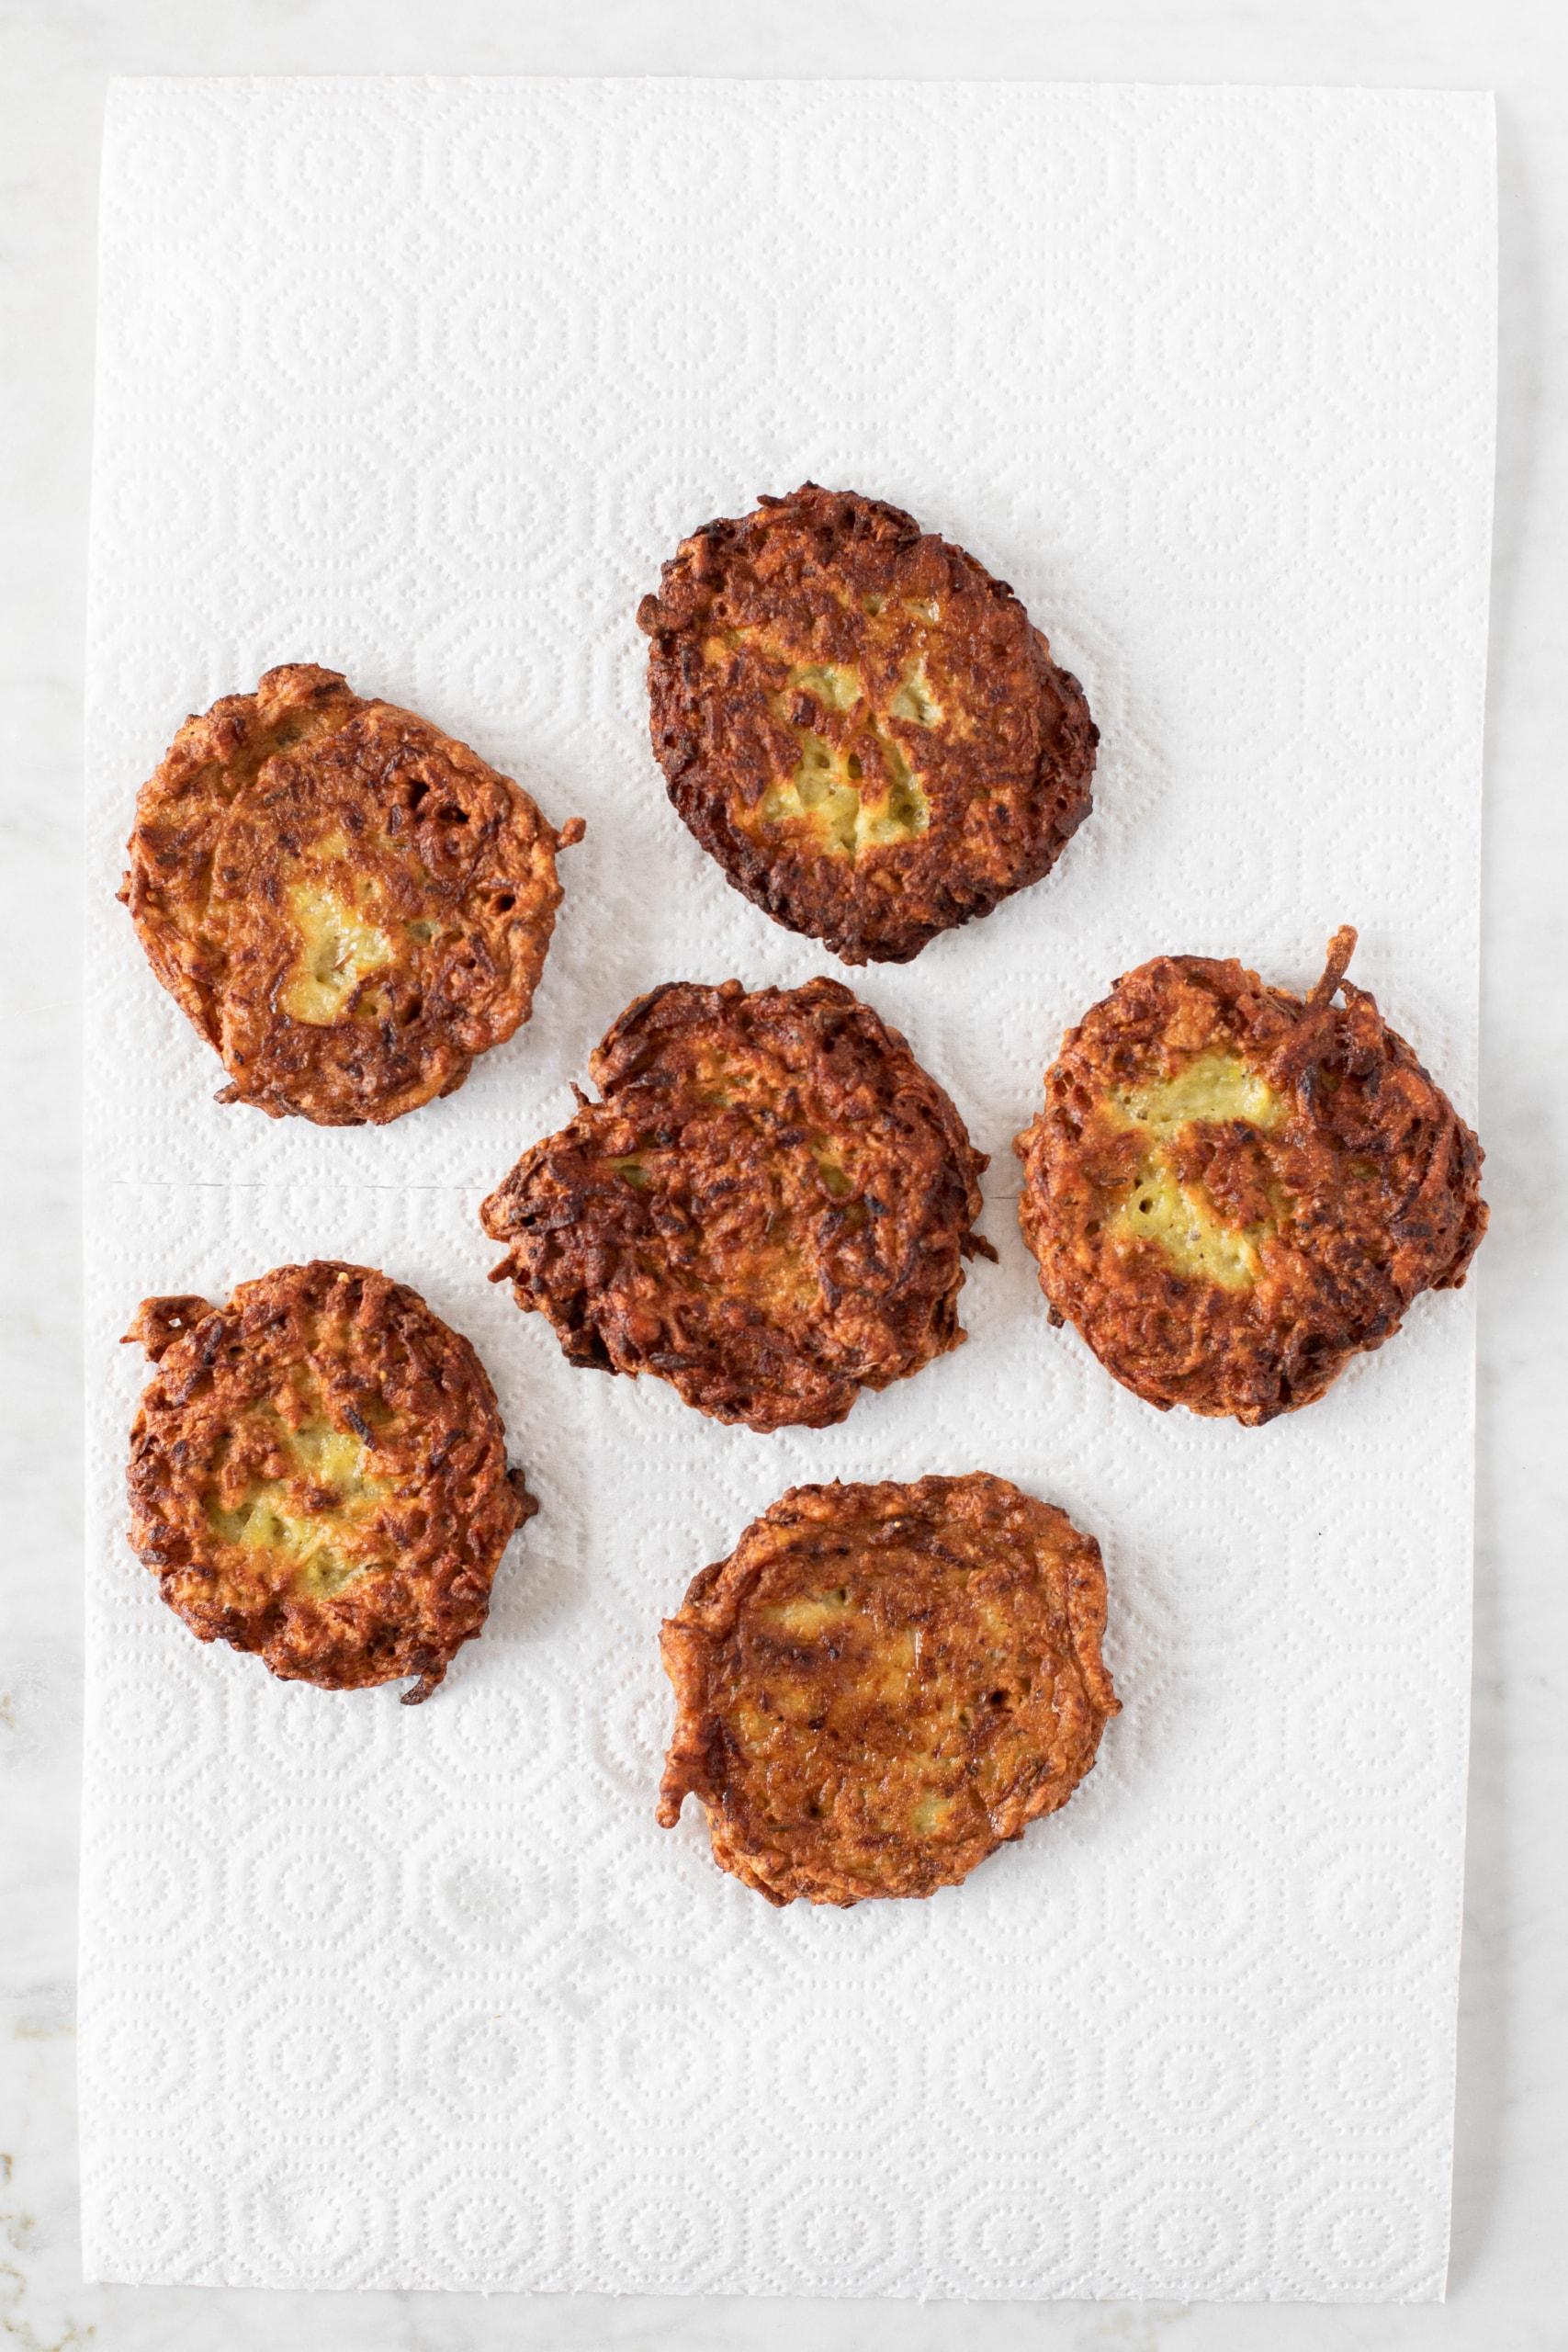 Czech potato pancakes (bramboráky) from verygoodcook.com